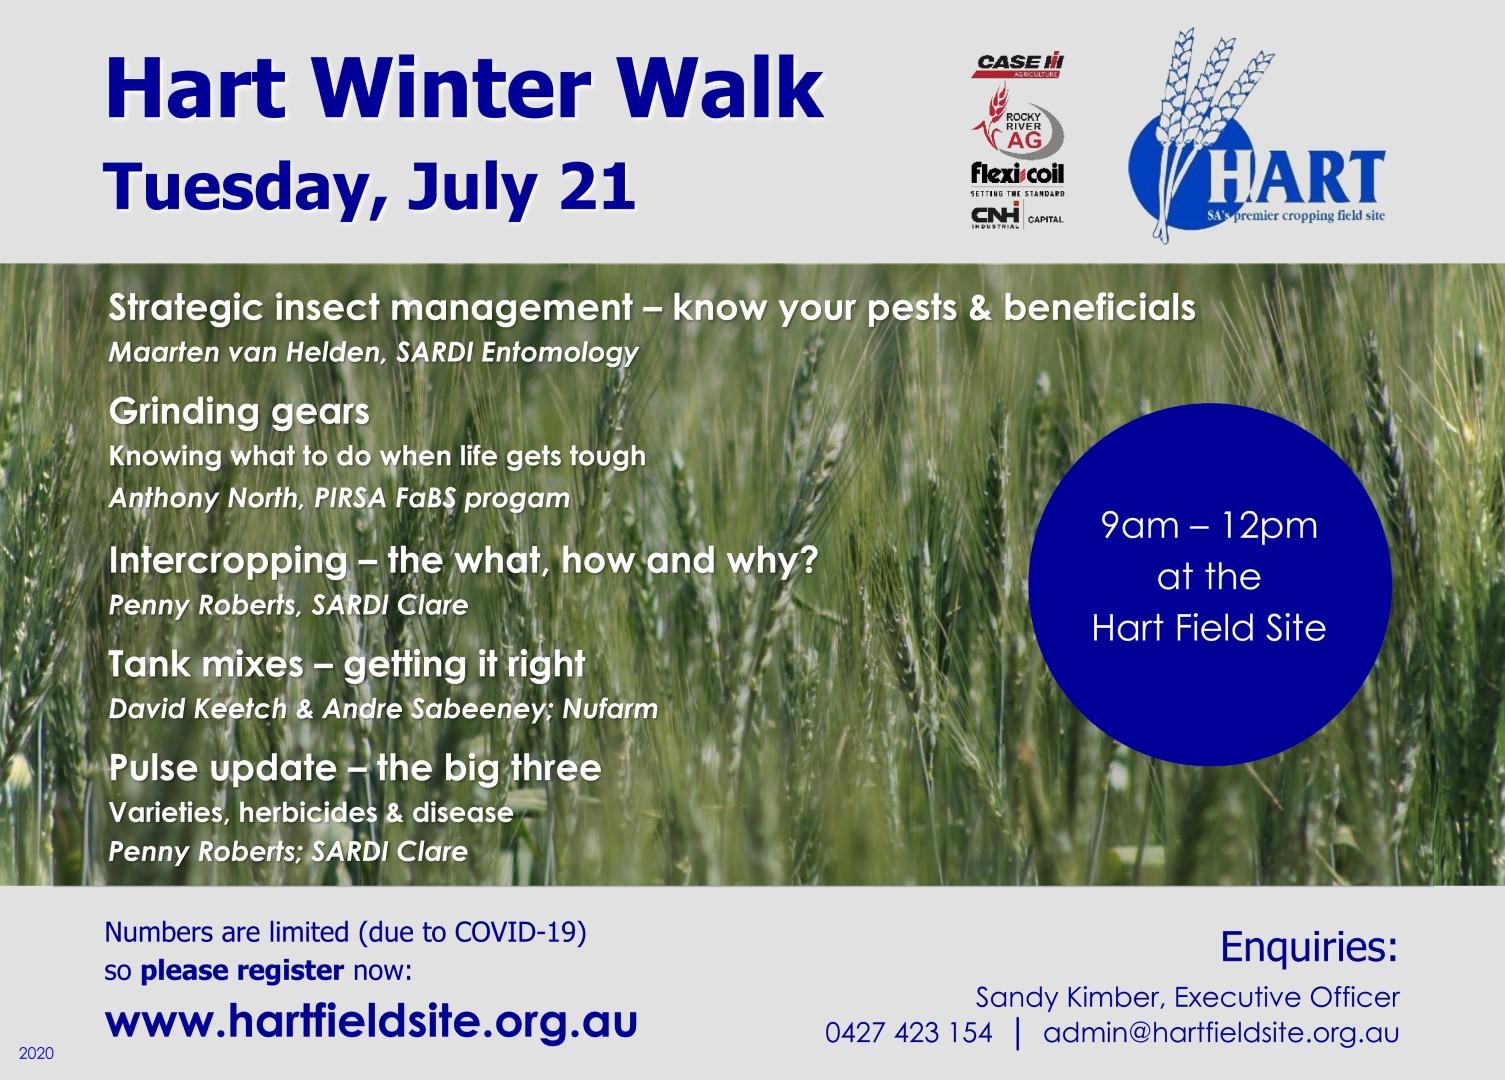 Hart Winter Walk 2020